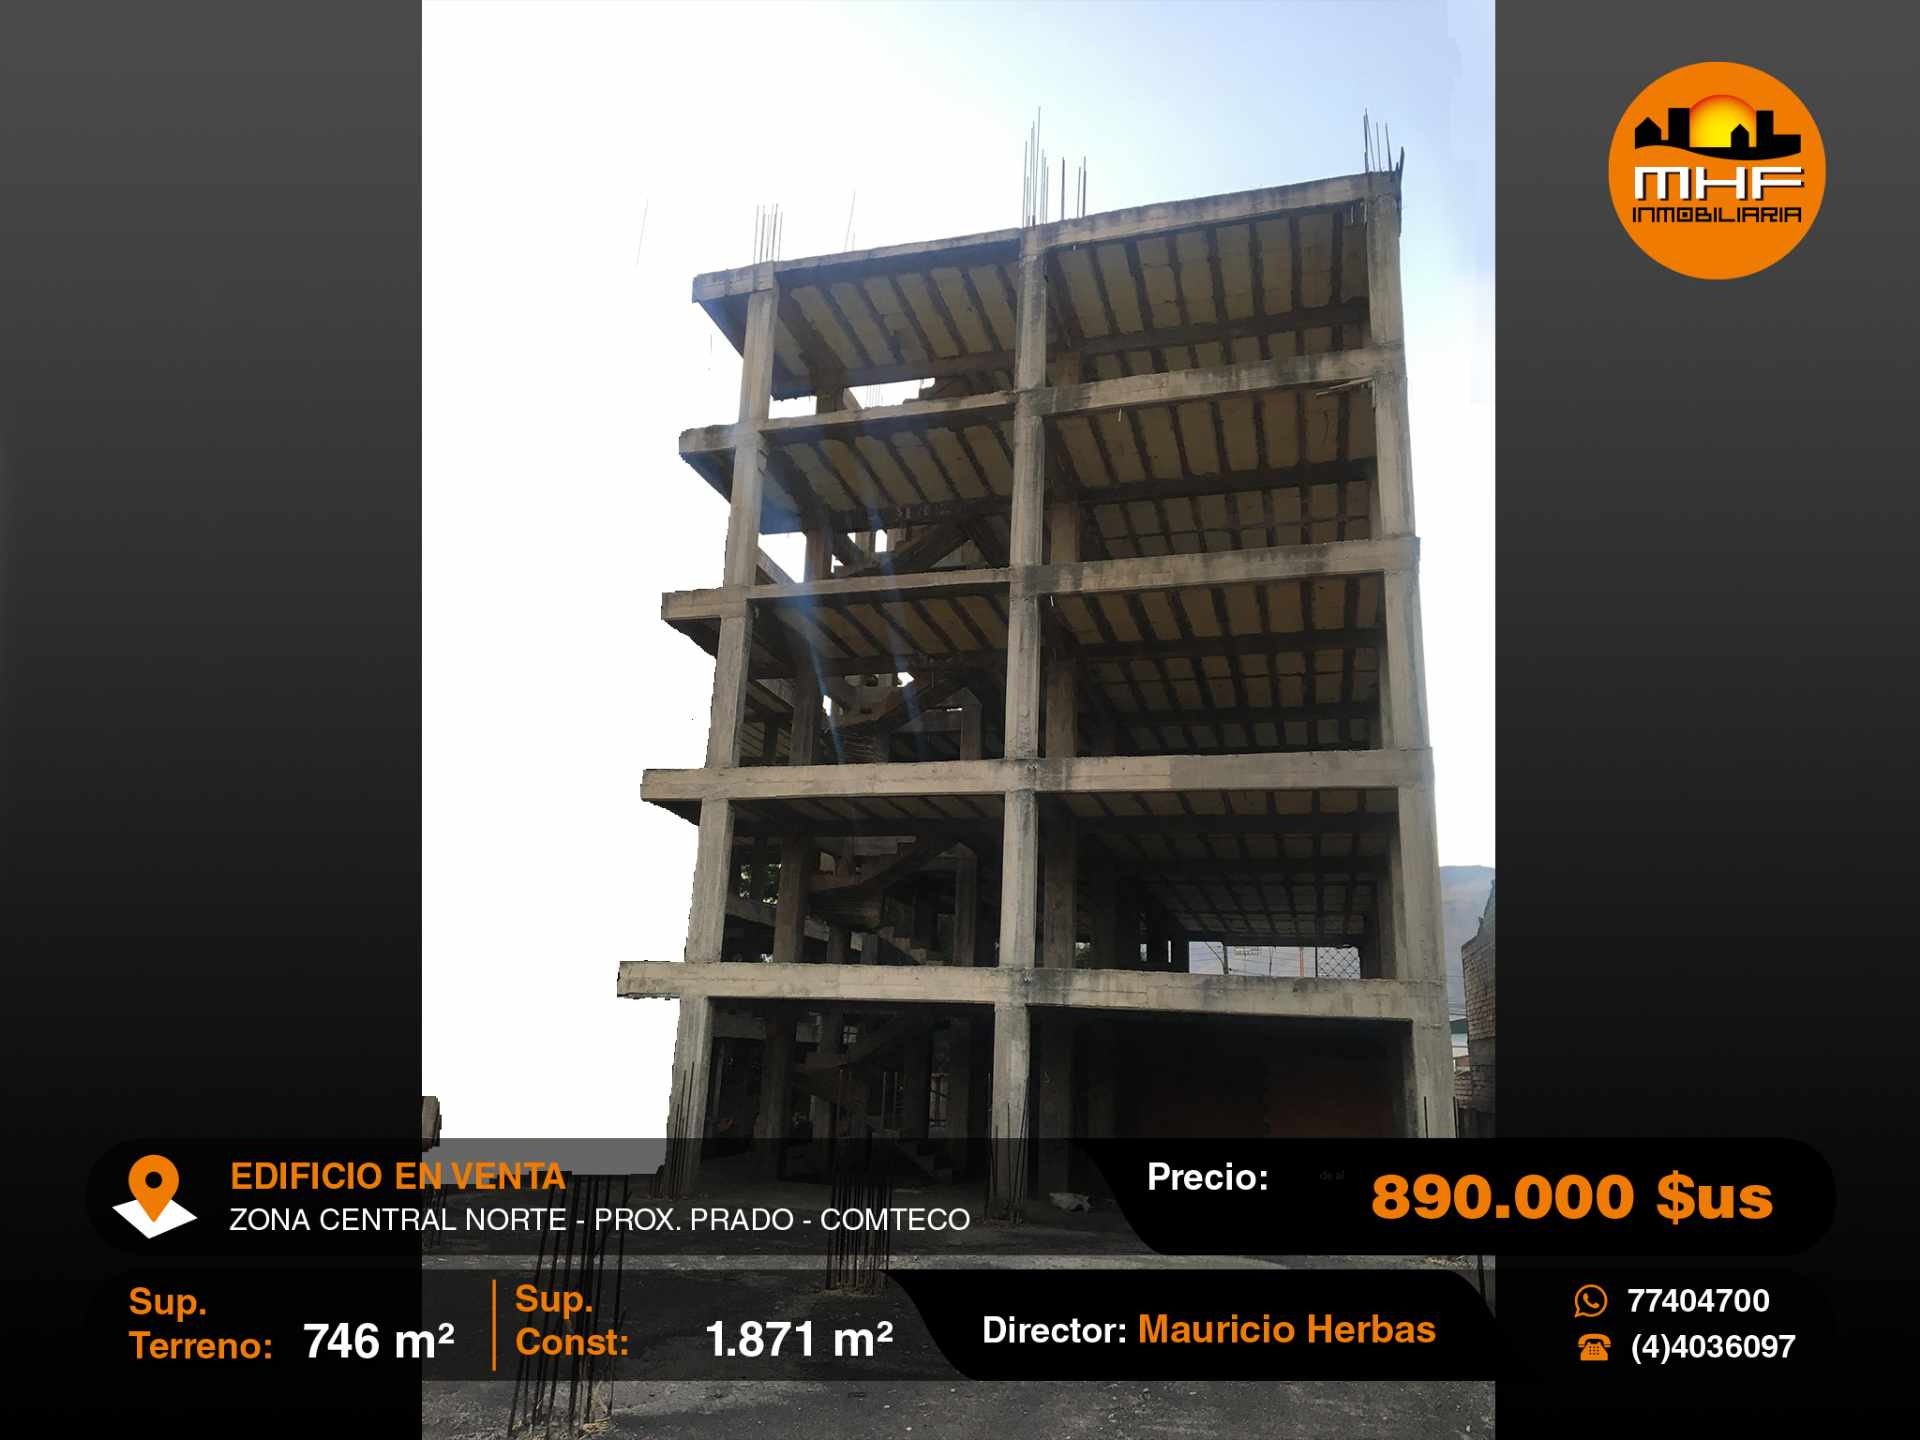 Edificio en Venta PROXIMO PRADO - COMTECO Foto 1